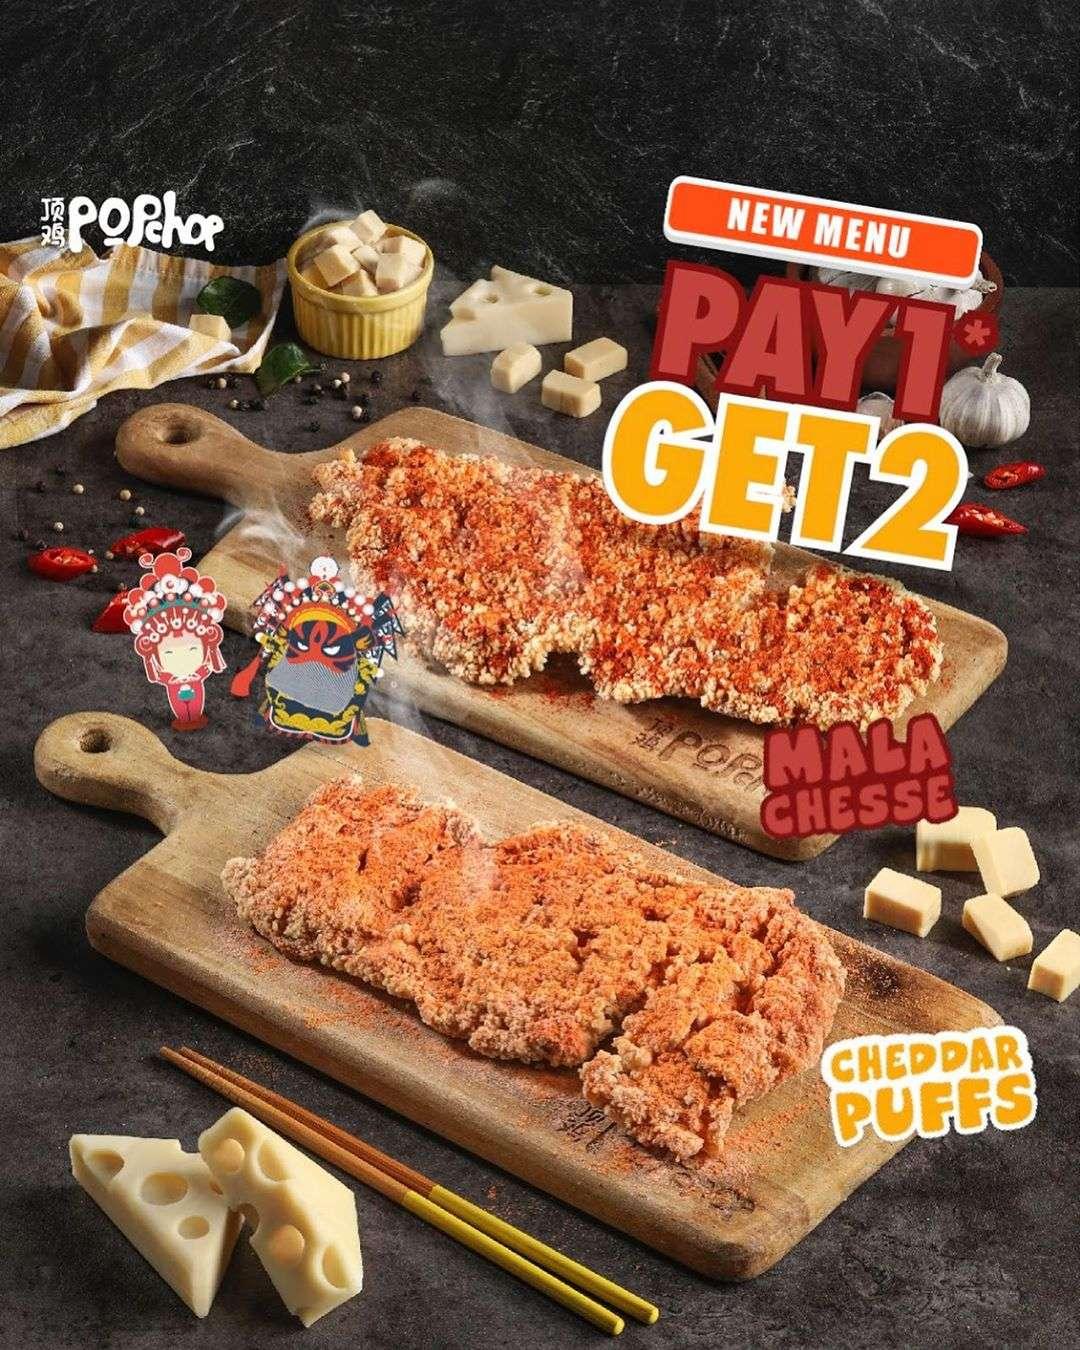 Diskon Popchop Promo Pay 1 Get 2  Untuk Pemesanan 2 Menu Baru Via GoFood